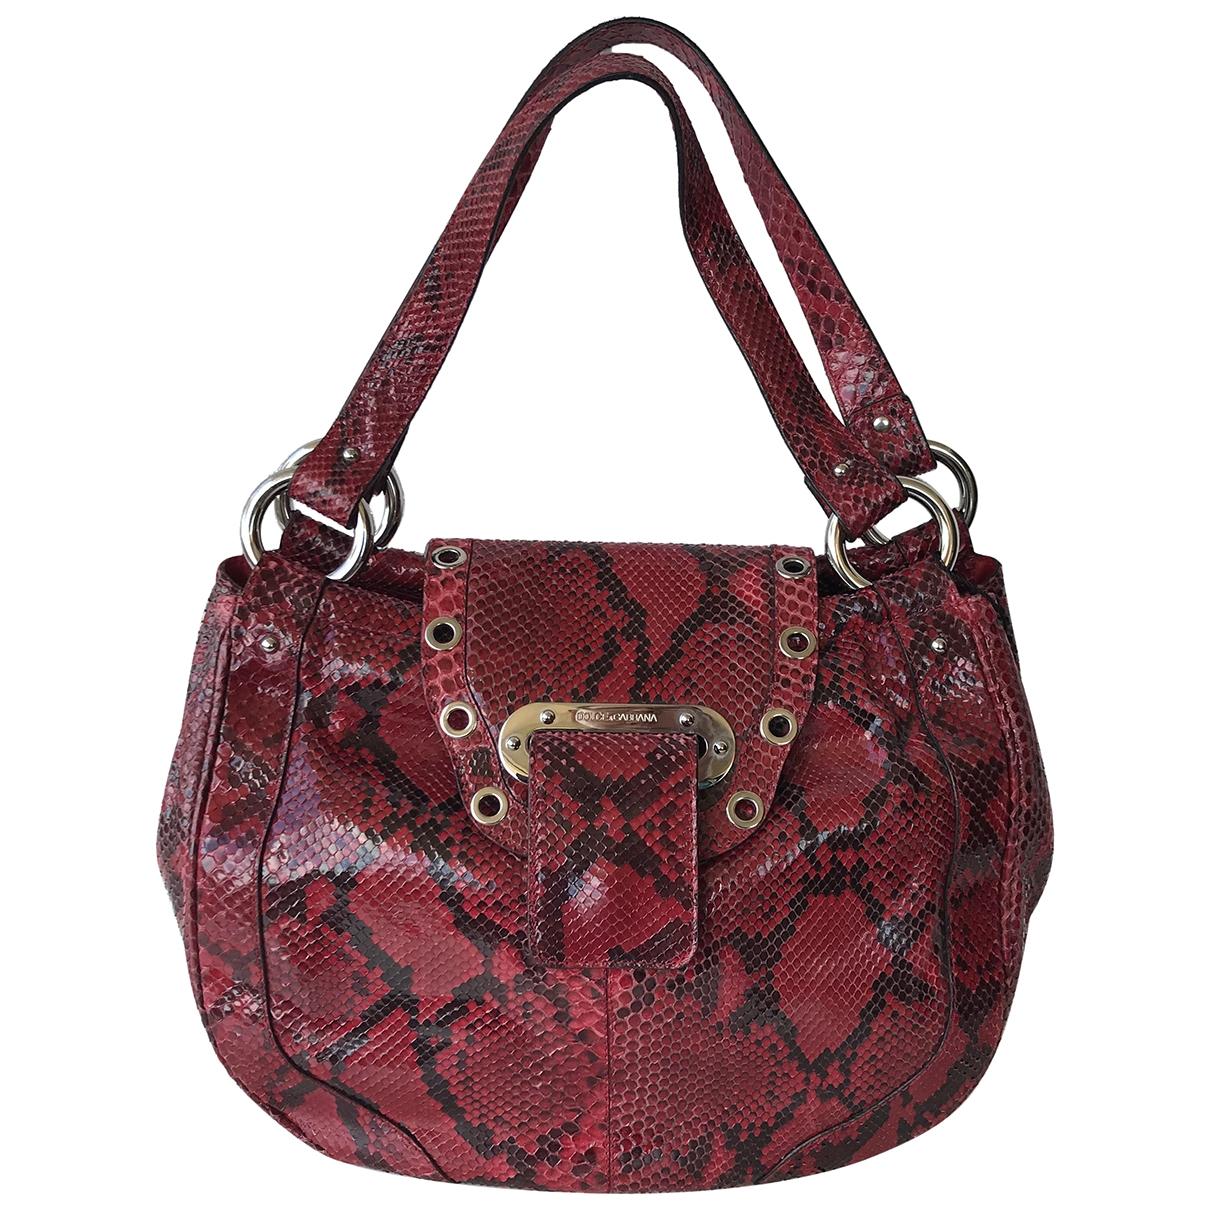 Bolso  de Piton Dolce & Gabbana